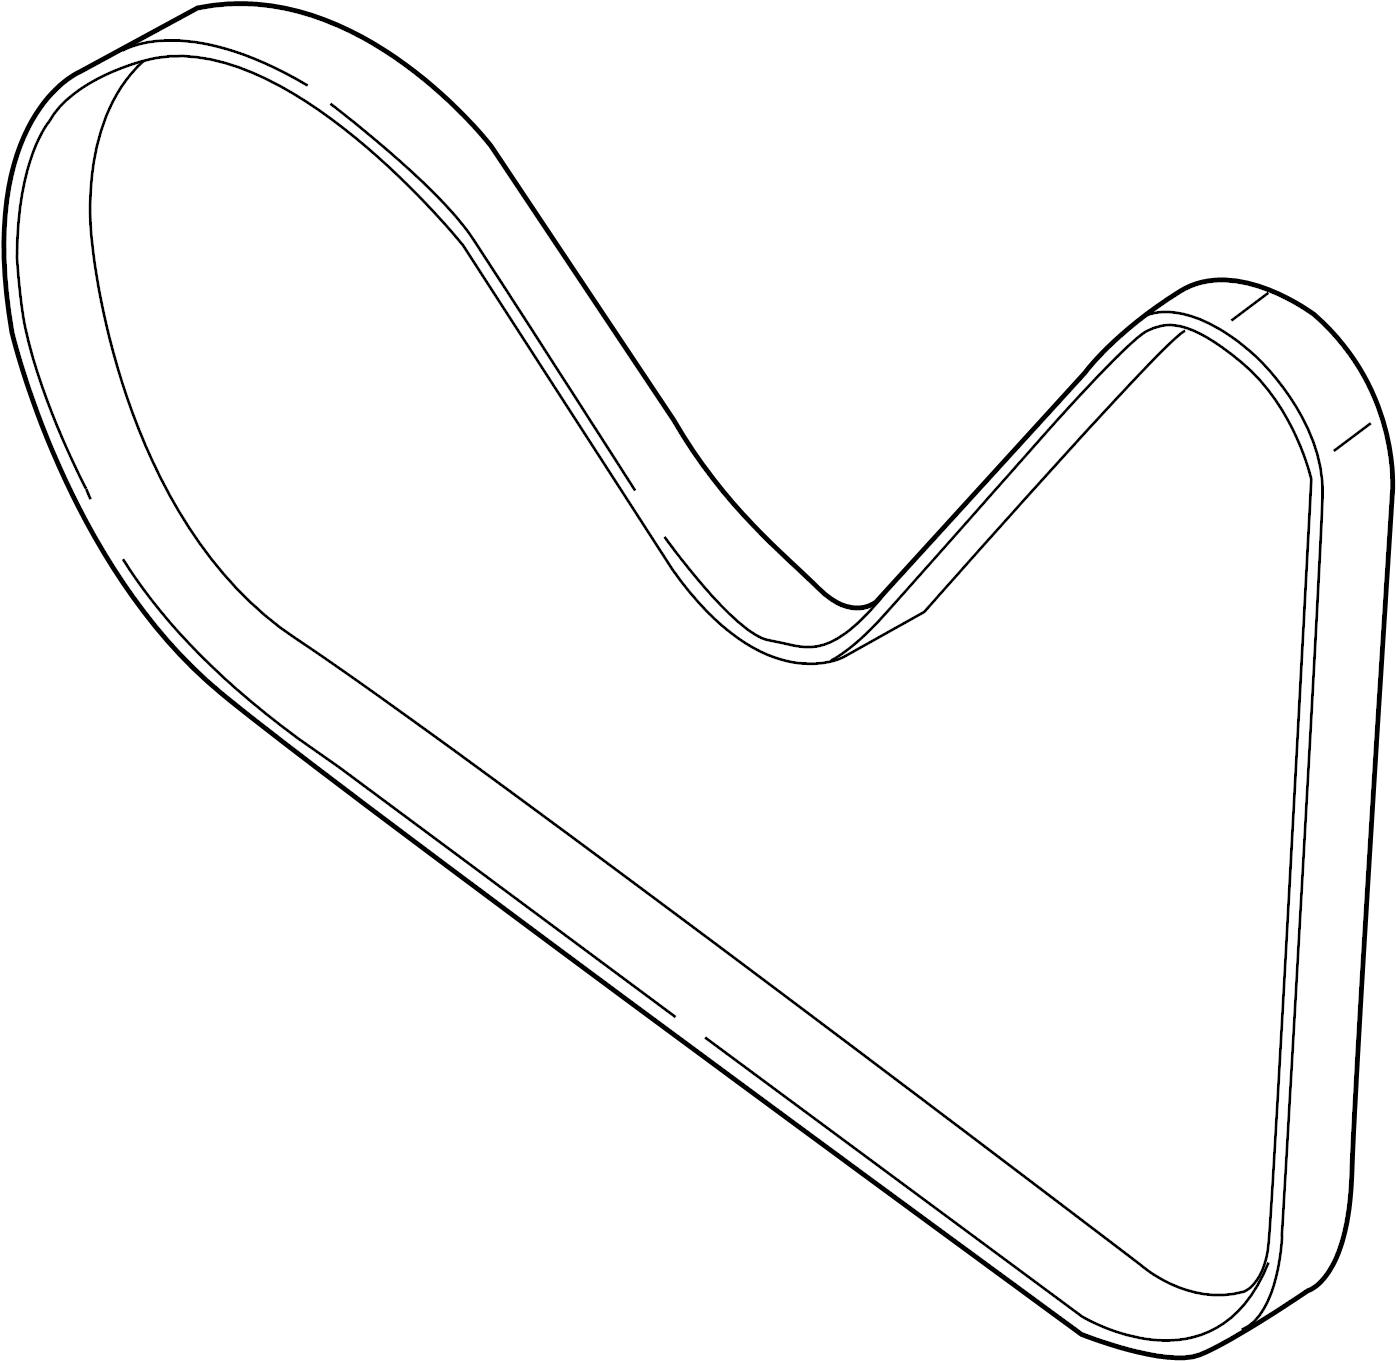 Ford Edge Accessory Drive Belt Serpentine Belt Liter Pulleys Belts